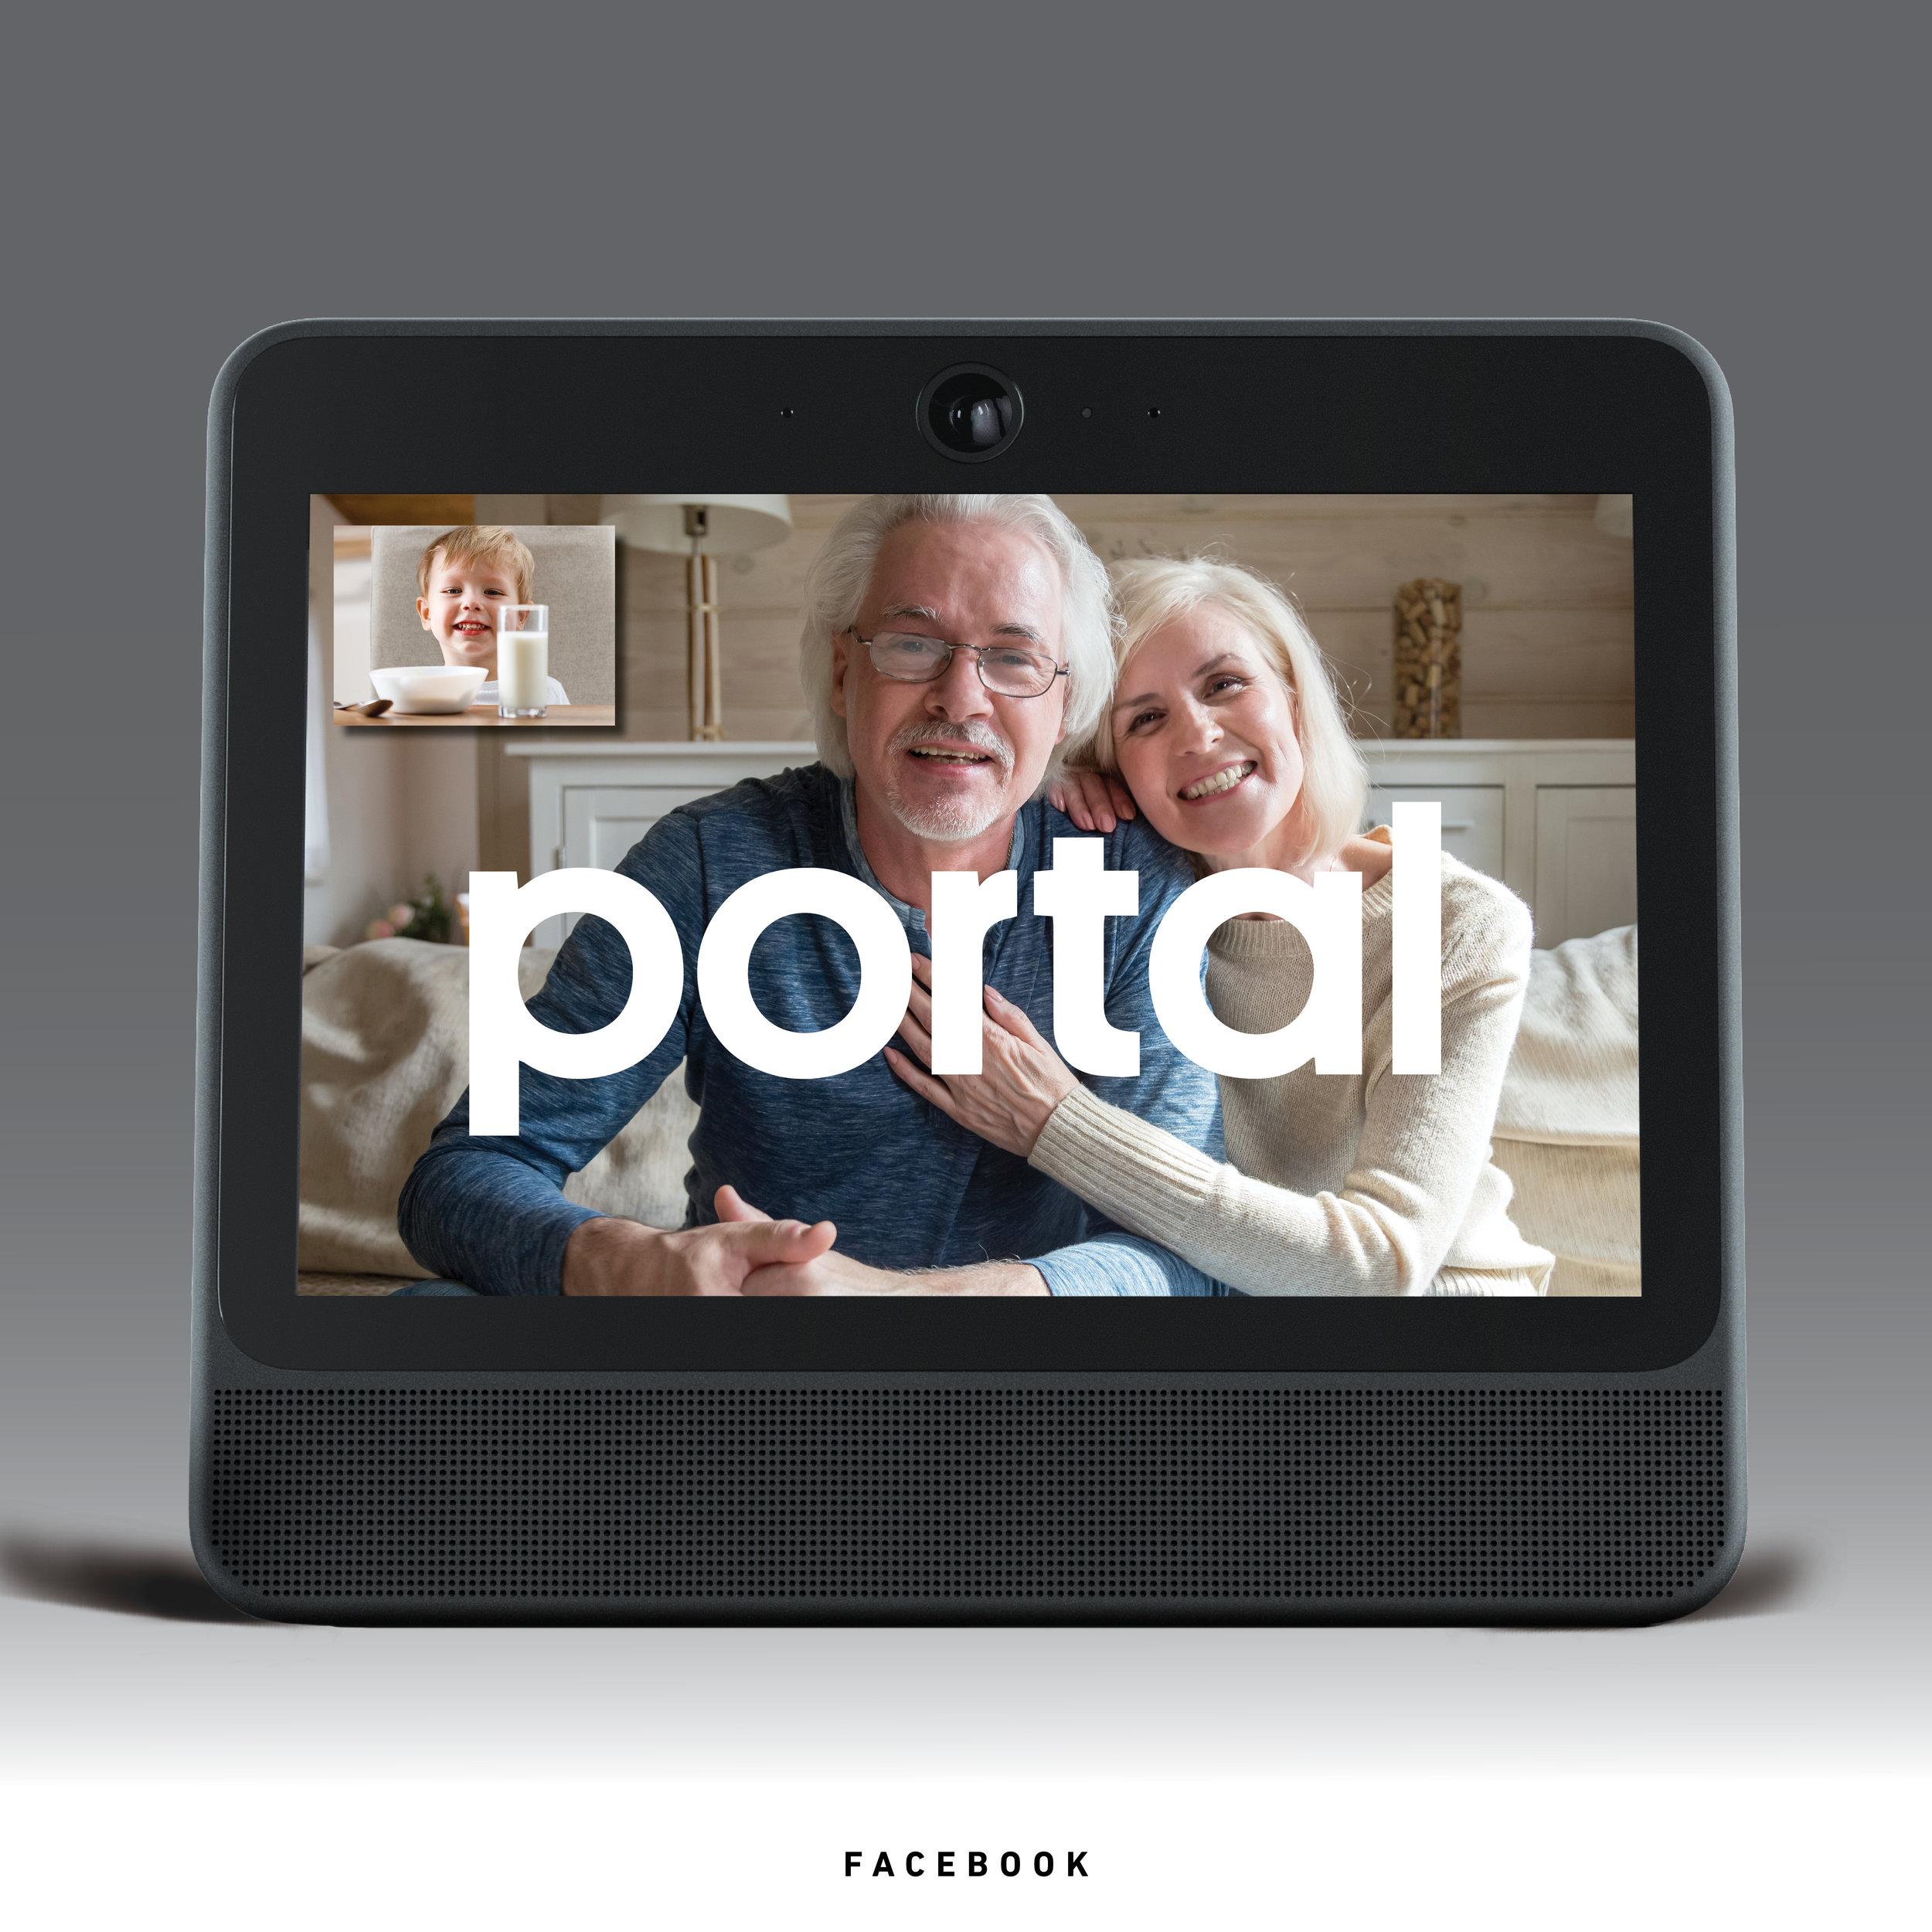 Portal (Facebook)